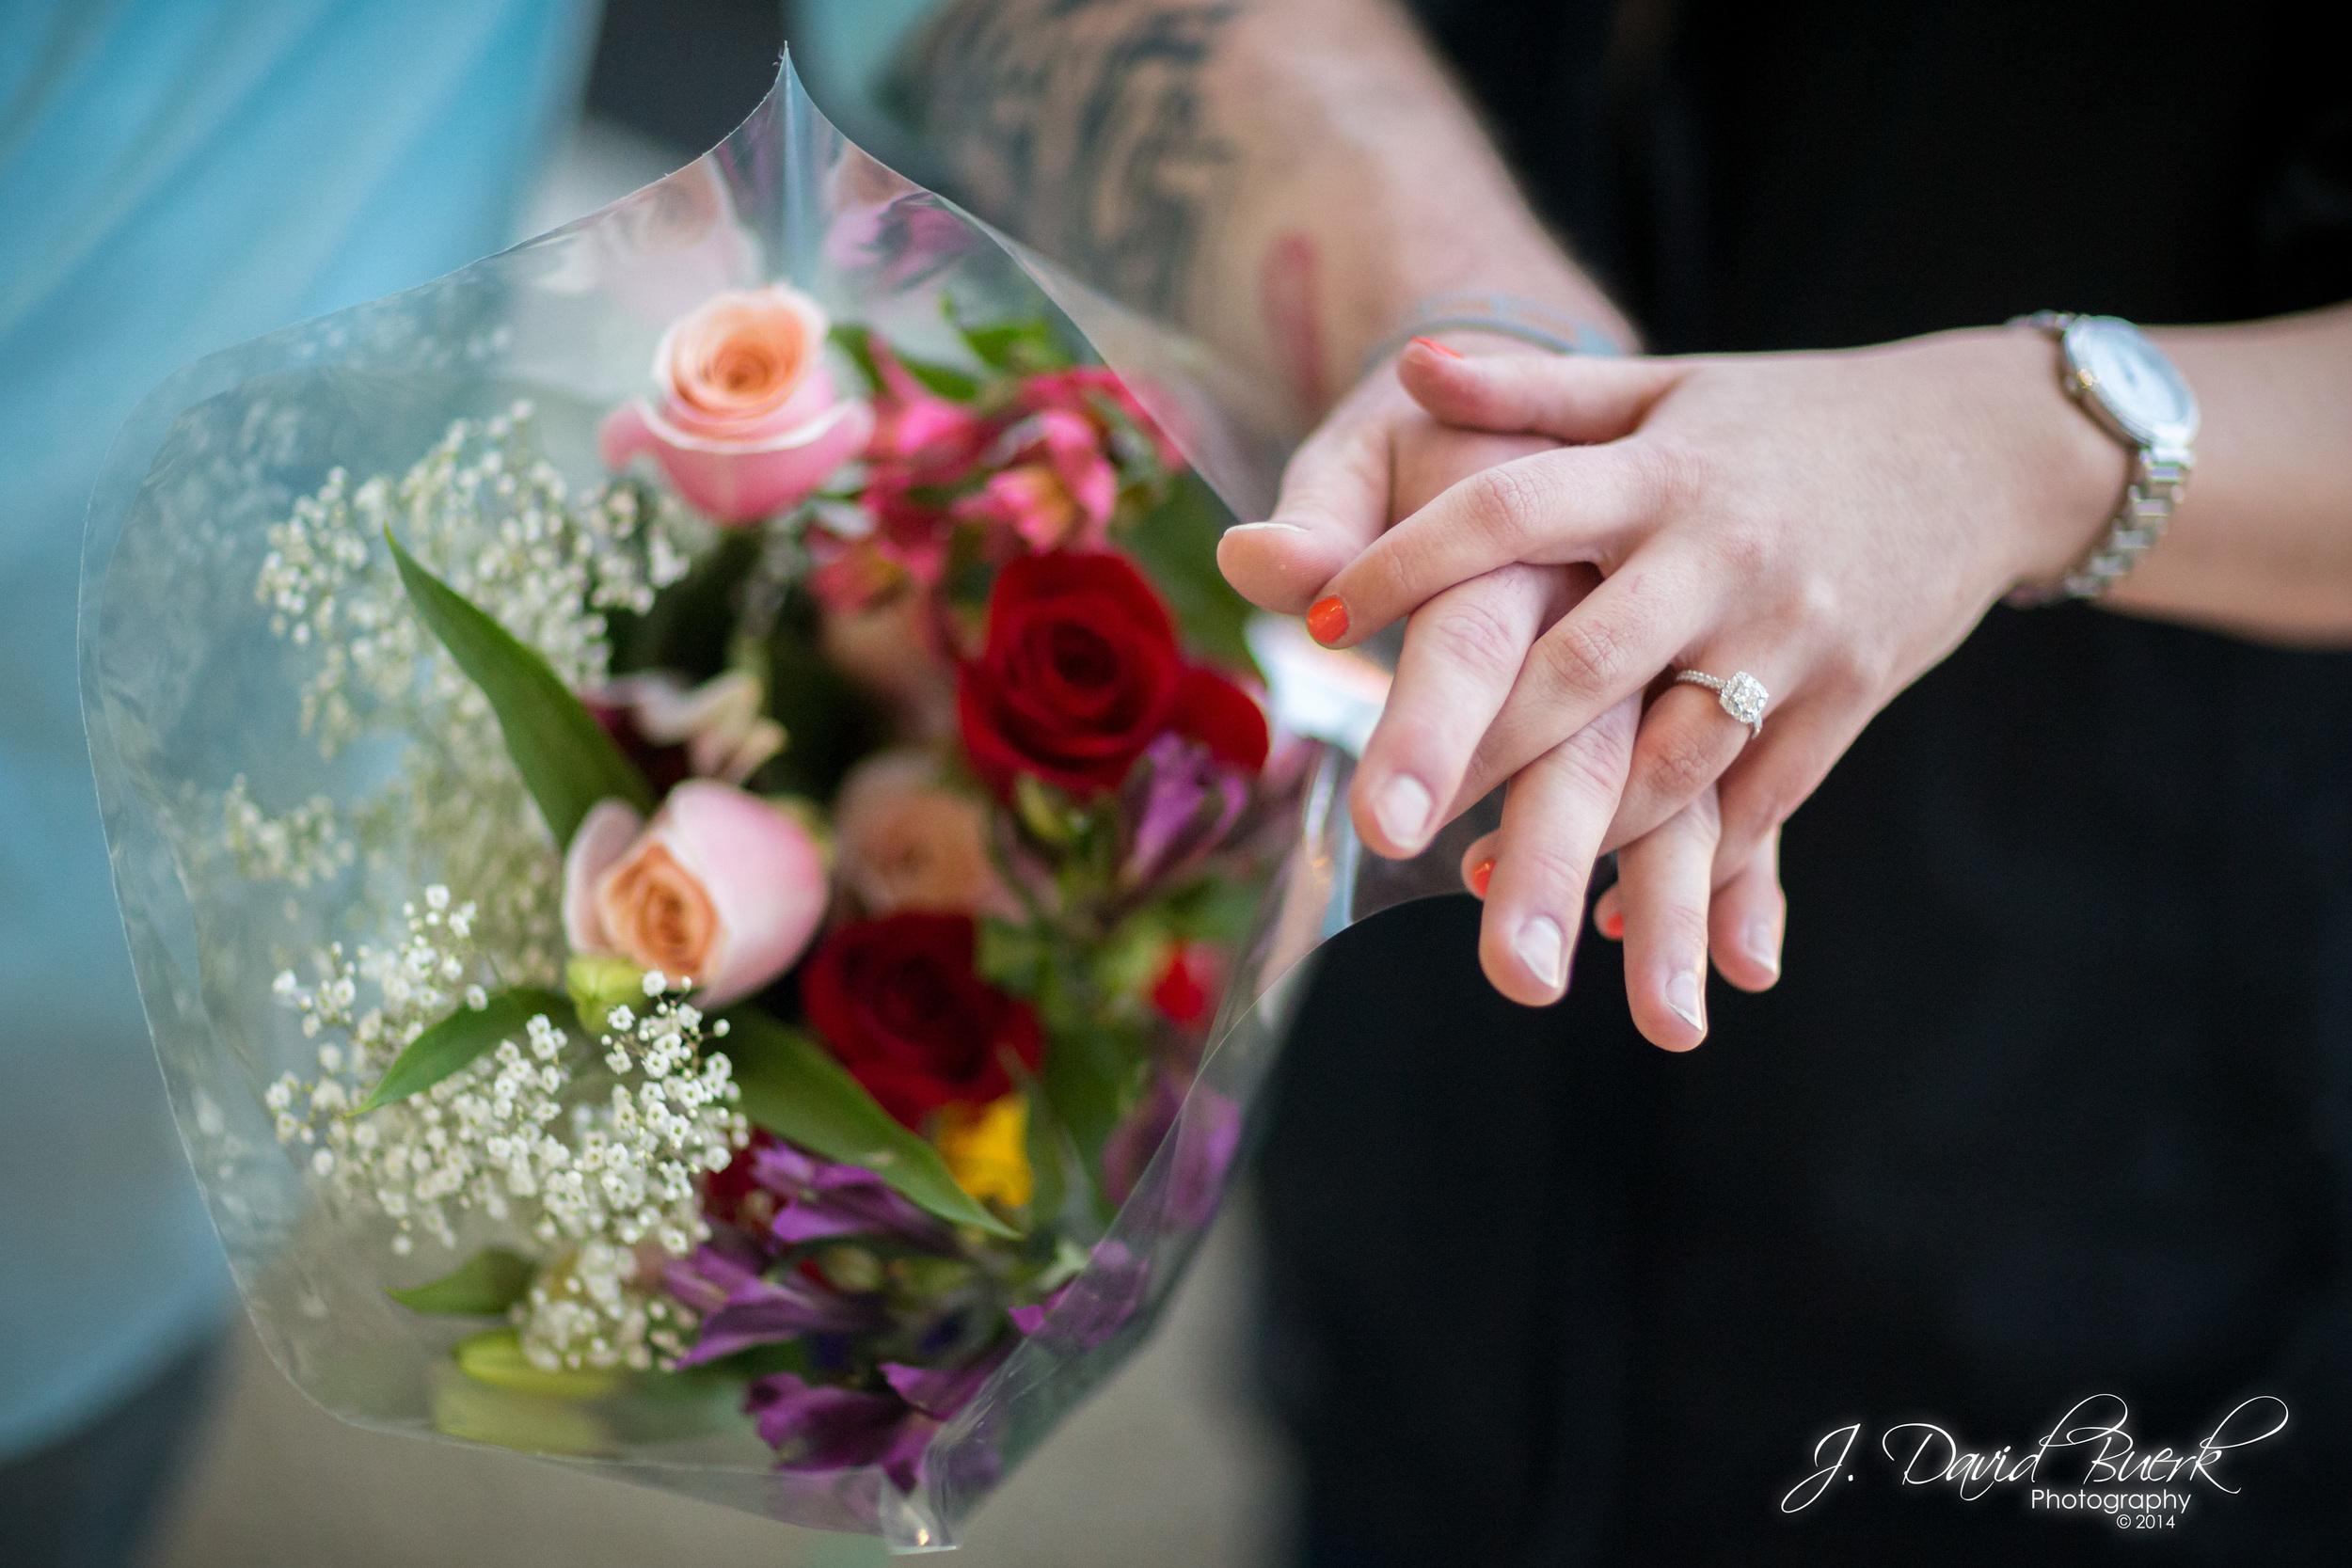 Matt and Amber - The Proposal (398 of 415) (IMGL5297).jpg